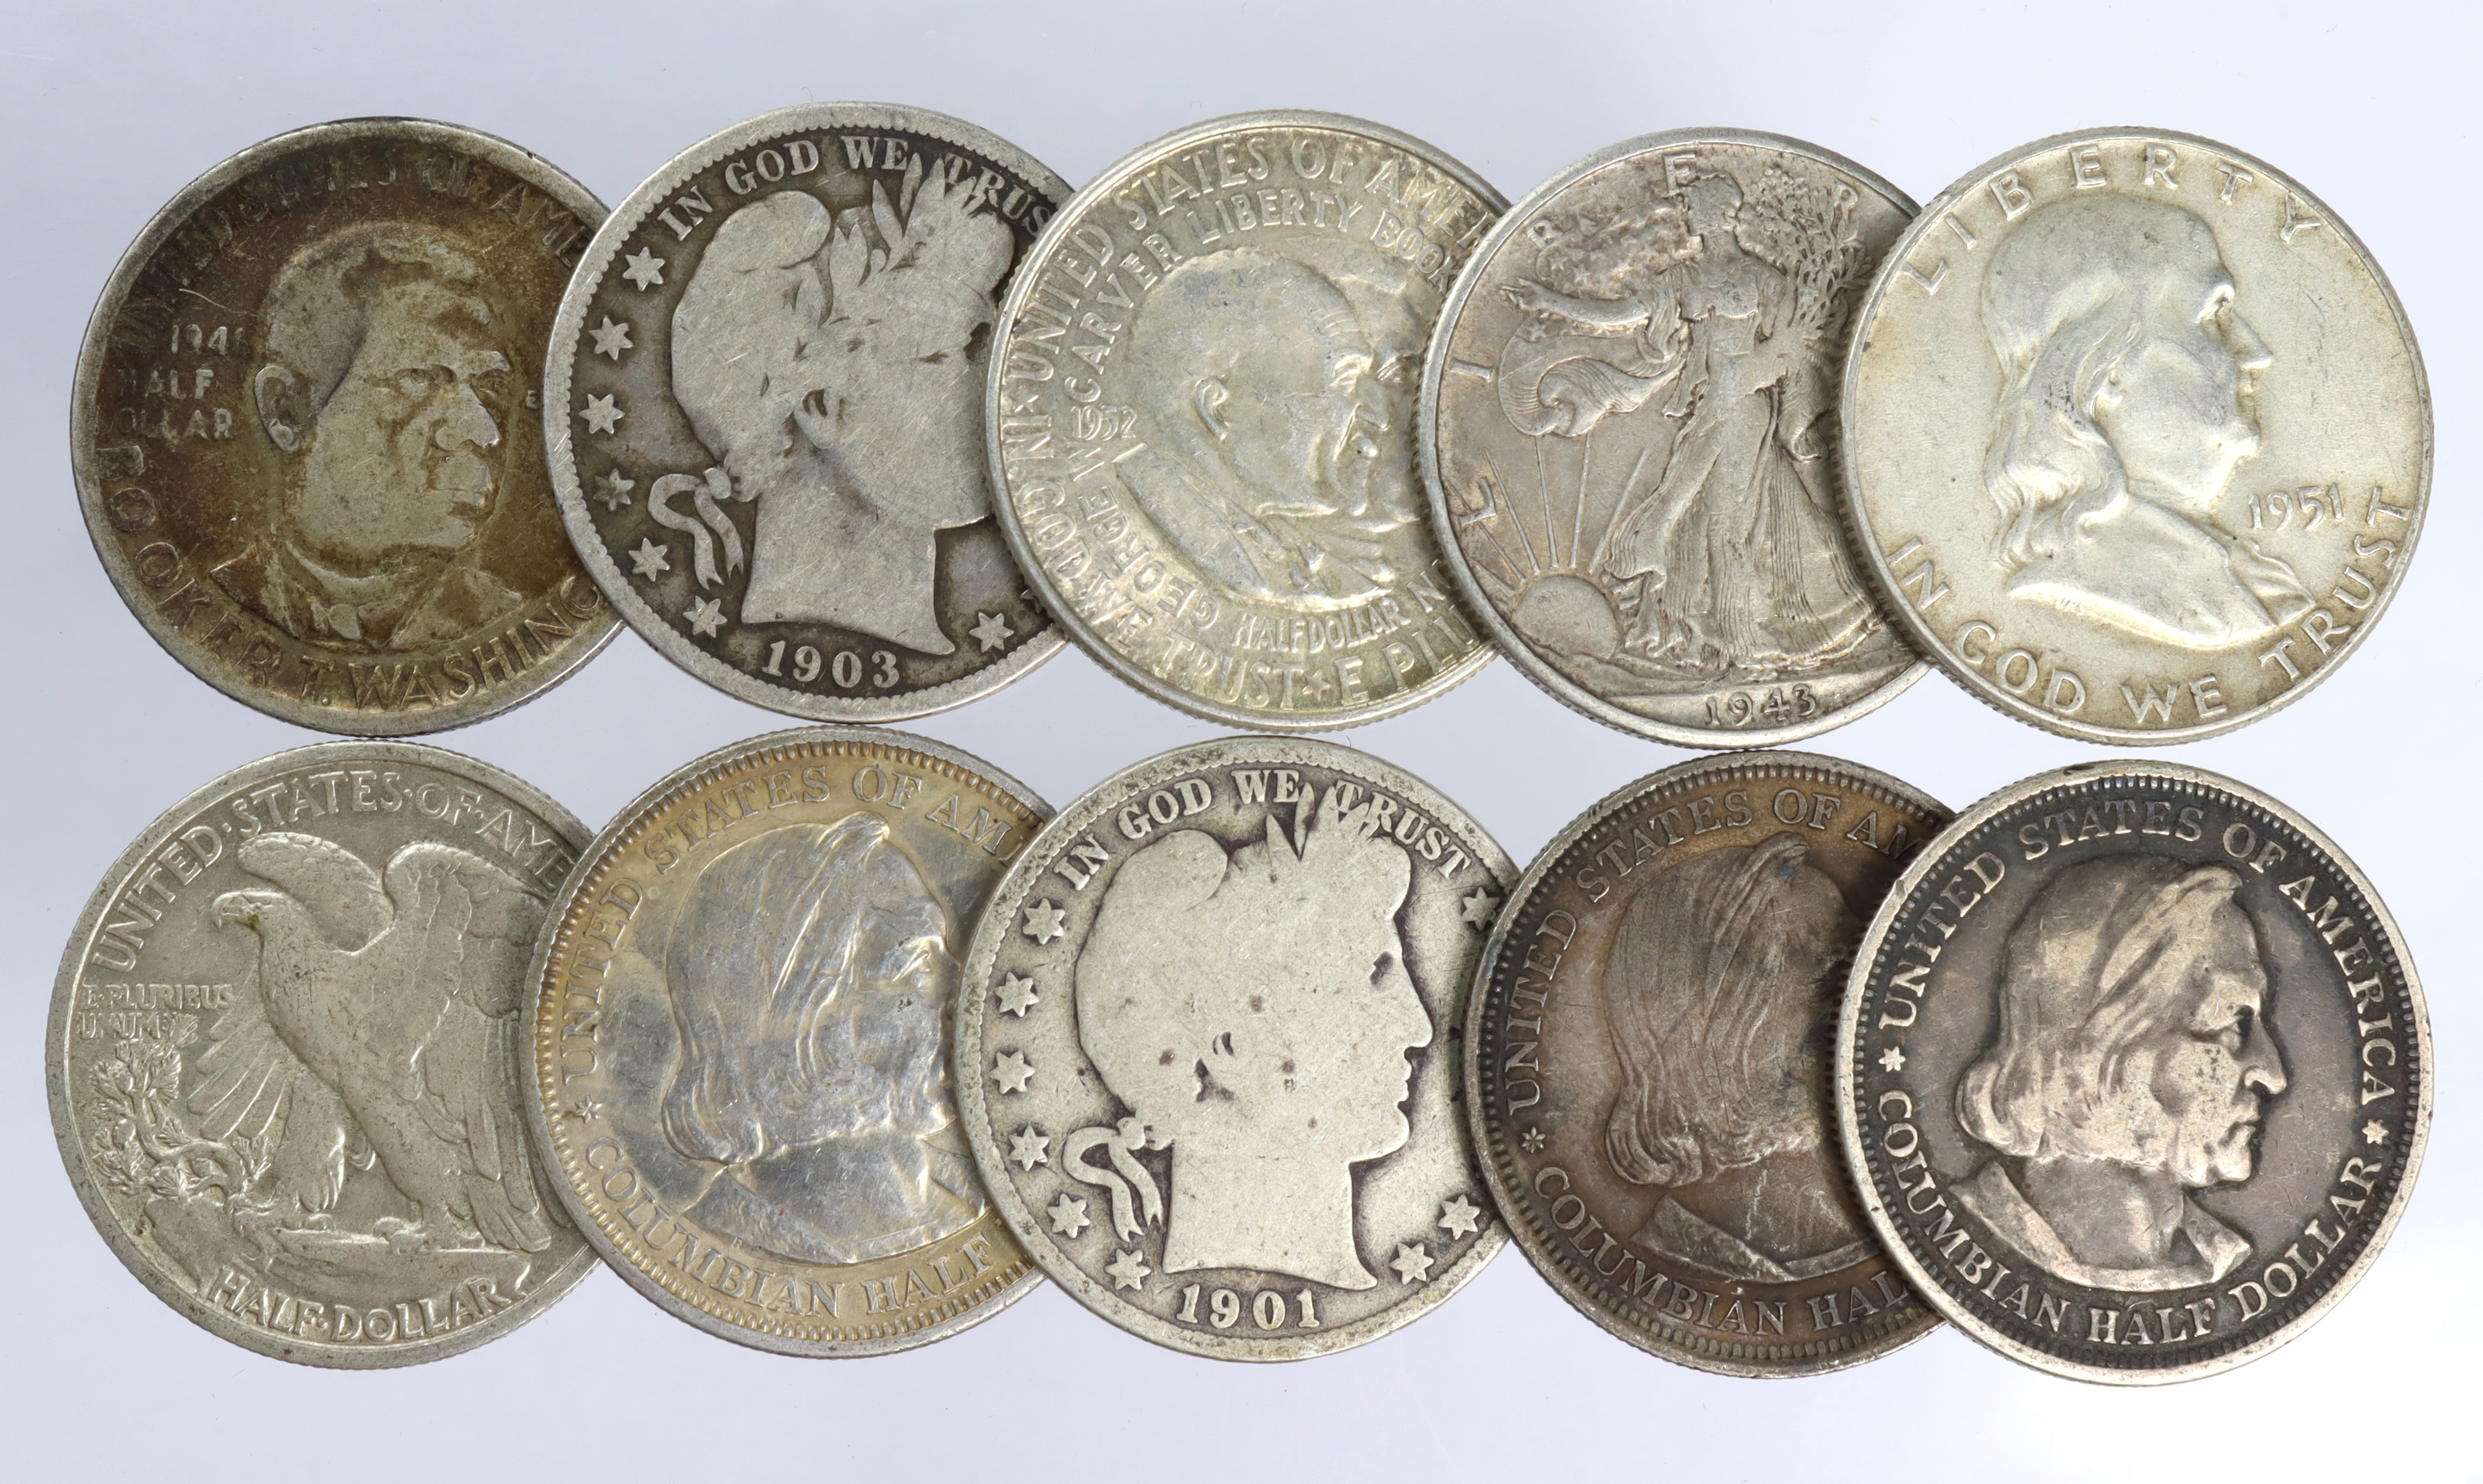 USA Silver Half Dollars (10) 1892 to 1952 including commemoratives, mixed grade.